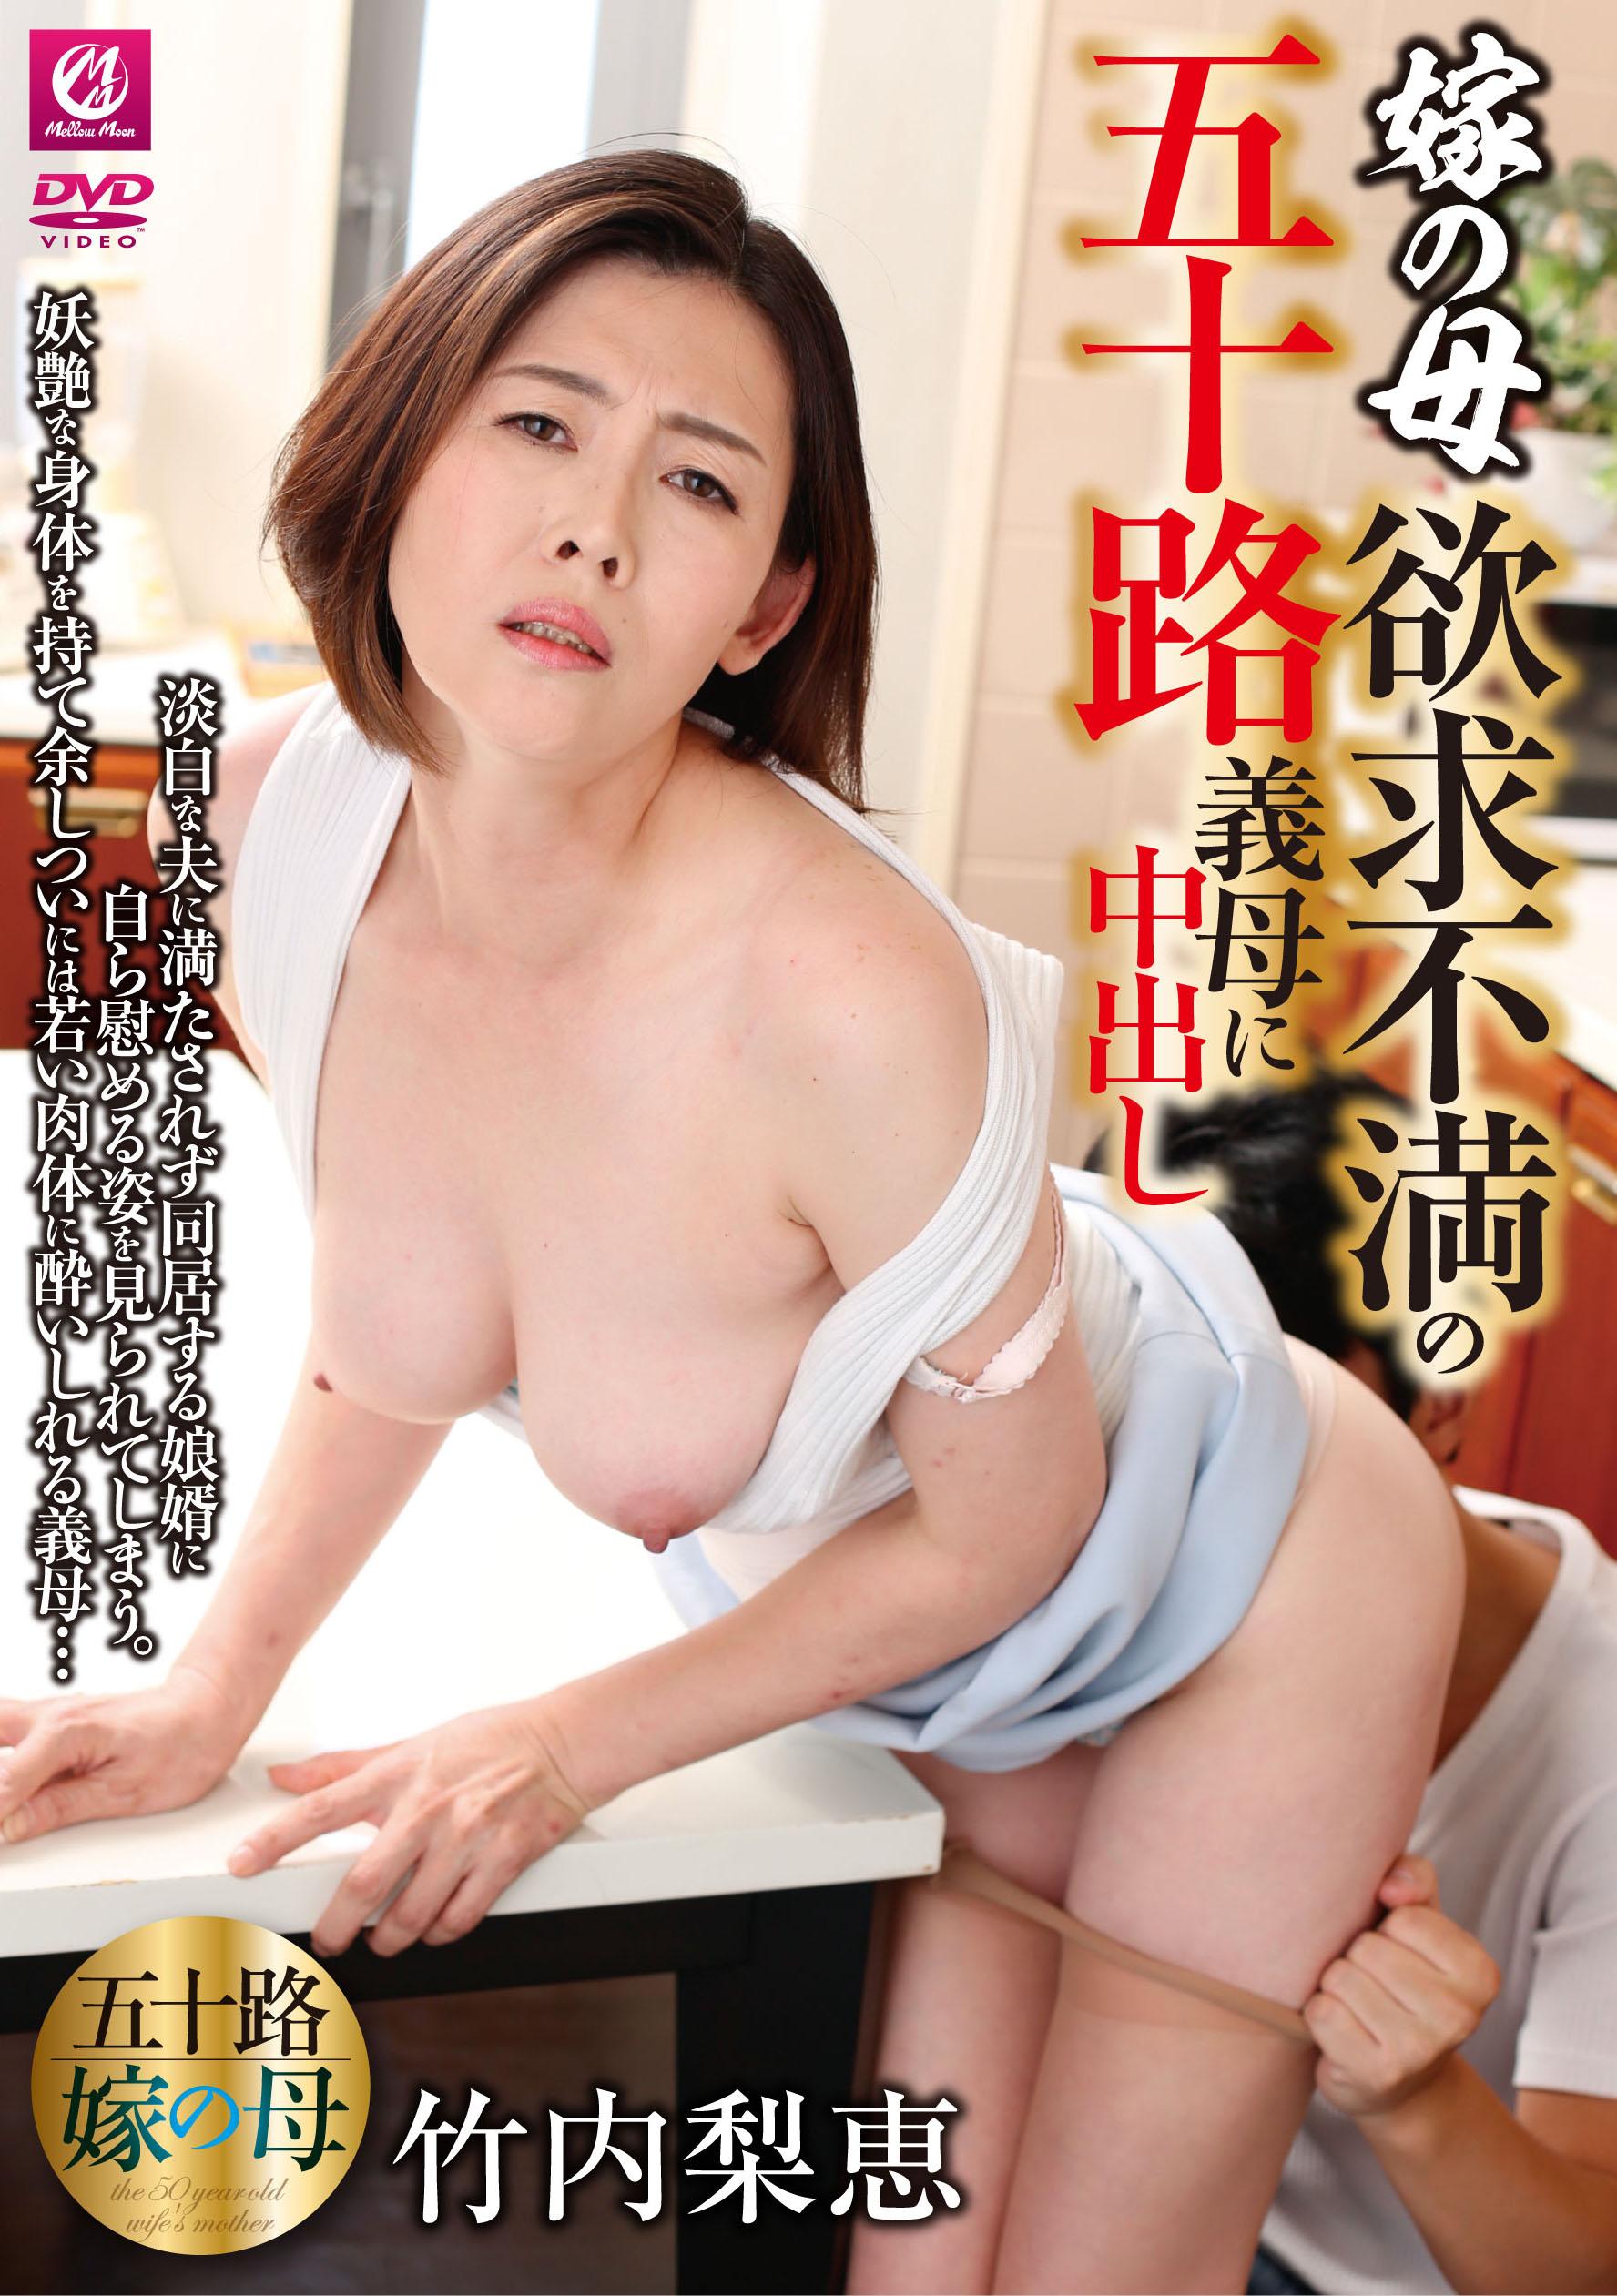 MLW-2168_JK_2_OL